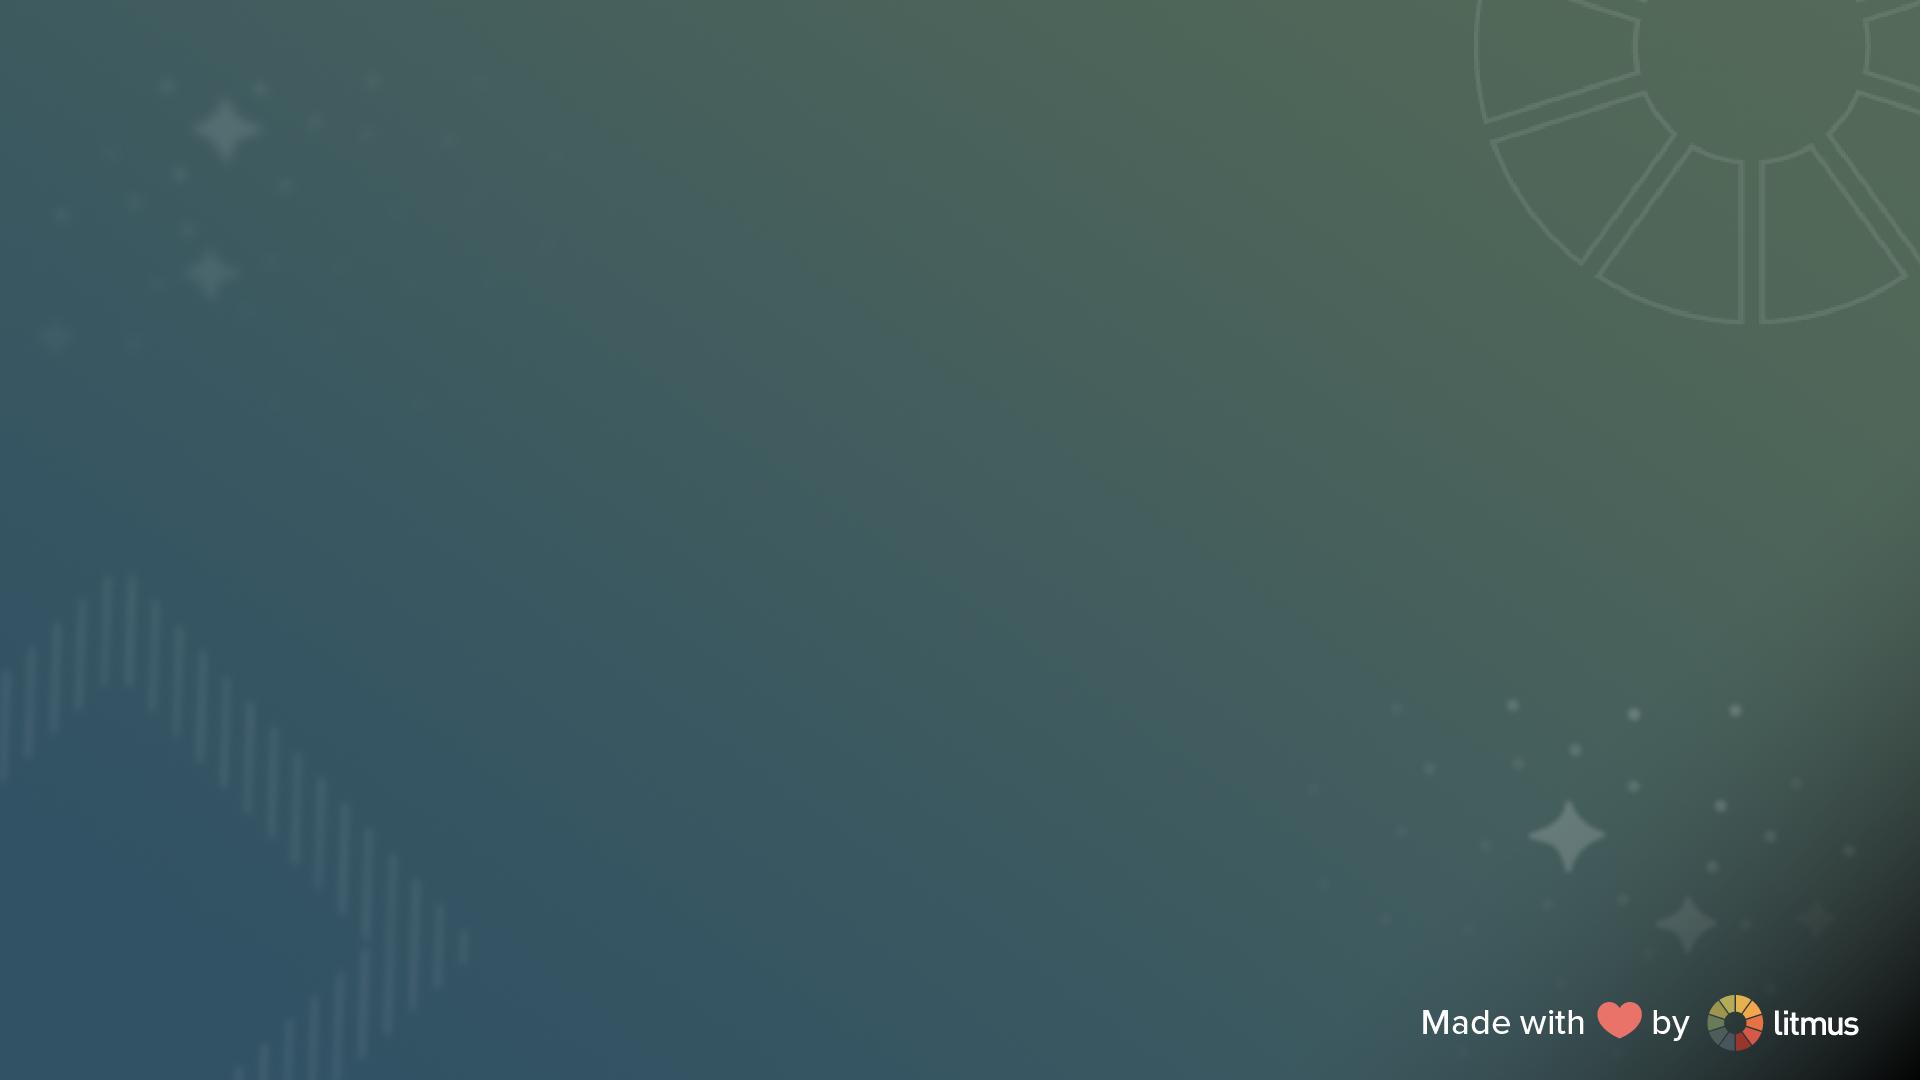 Gradient Virtual Backgrounds